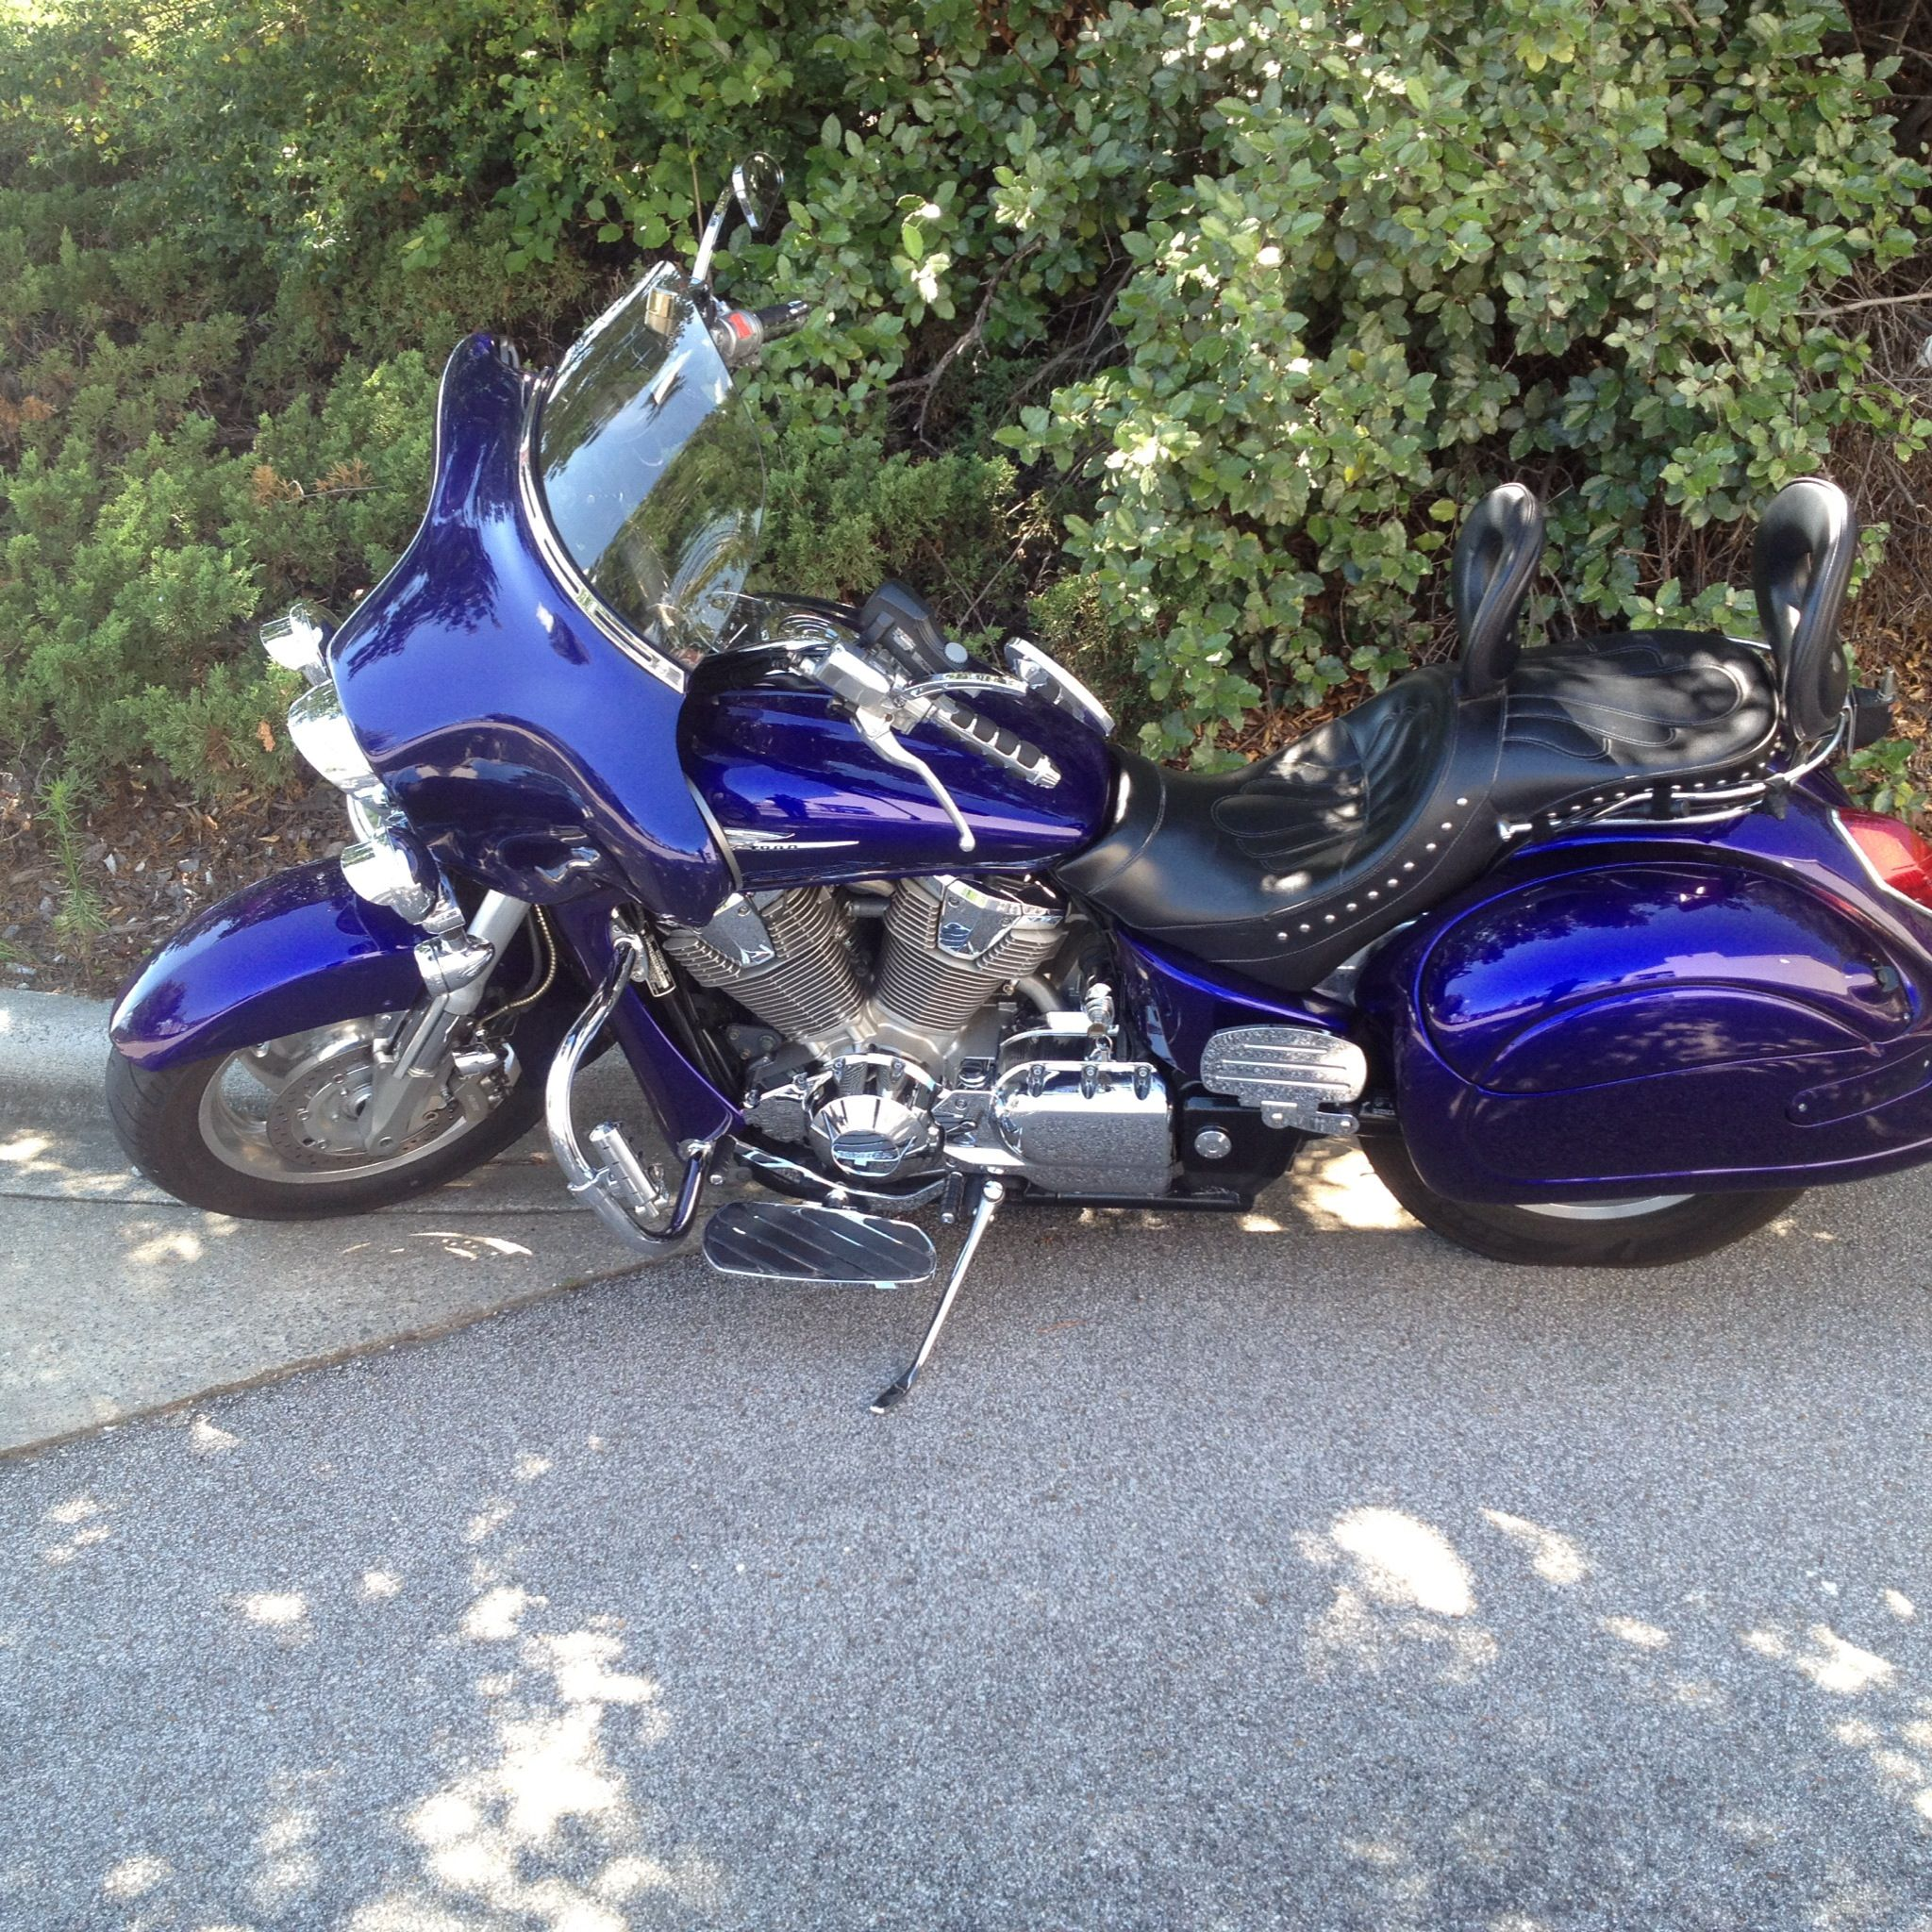 medium resolution of 2003 honda vtx 1800 retro illusion blue corbin dual tourer seat beetlebags wide open customs fairing